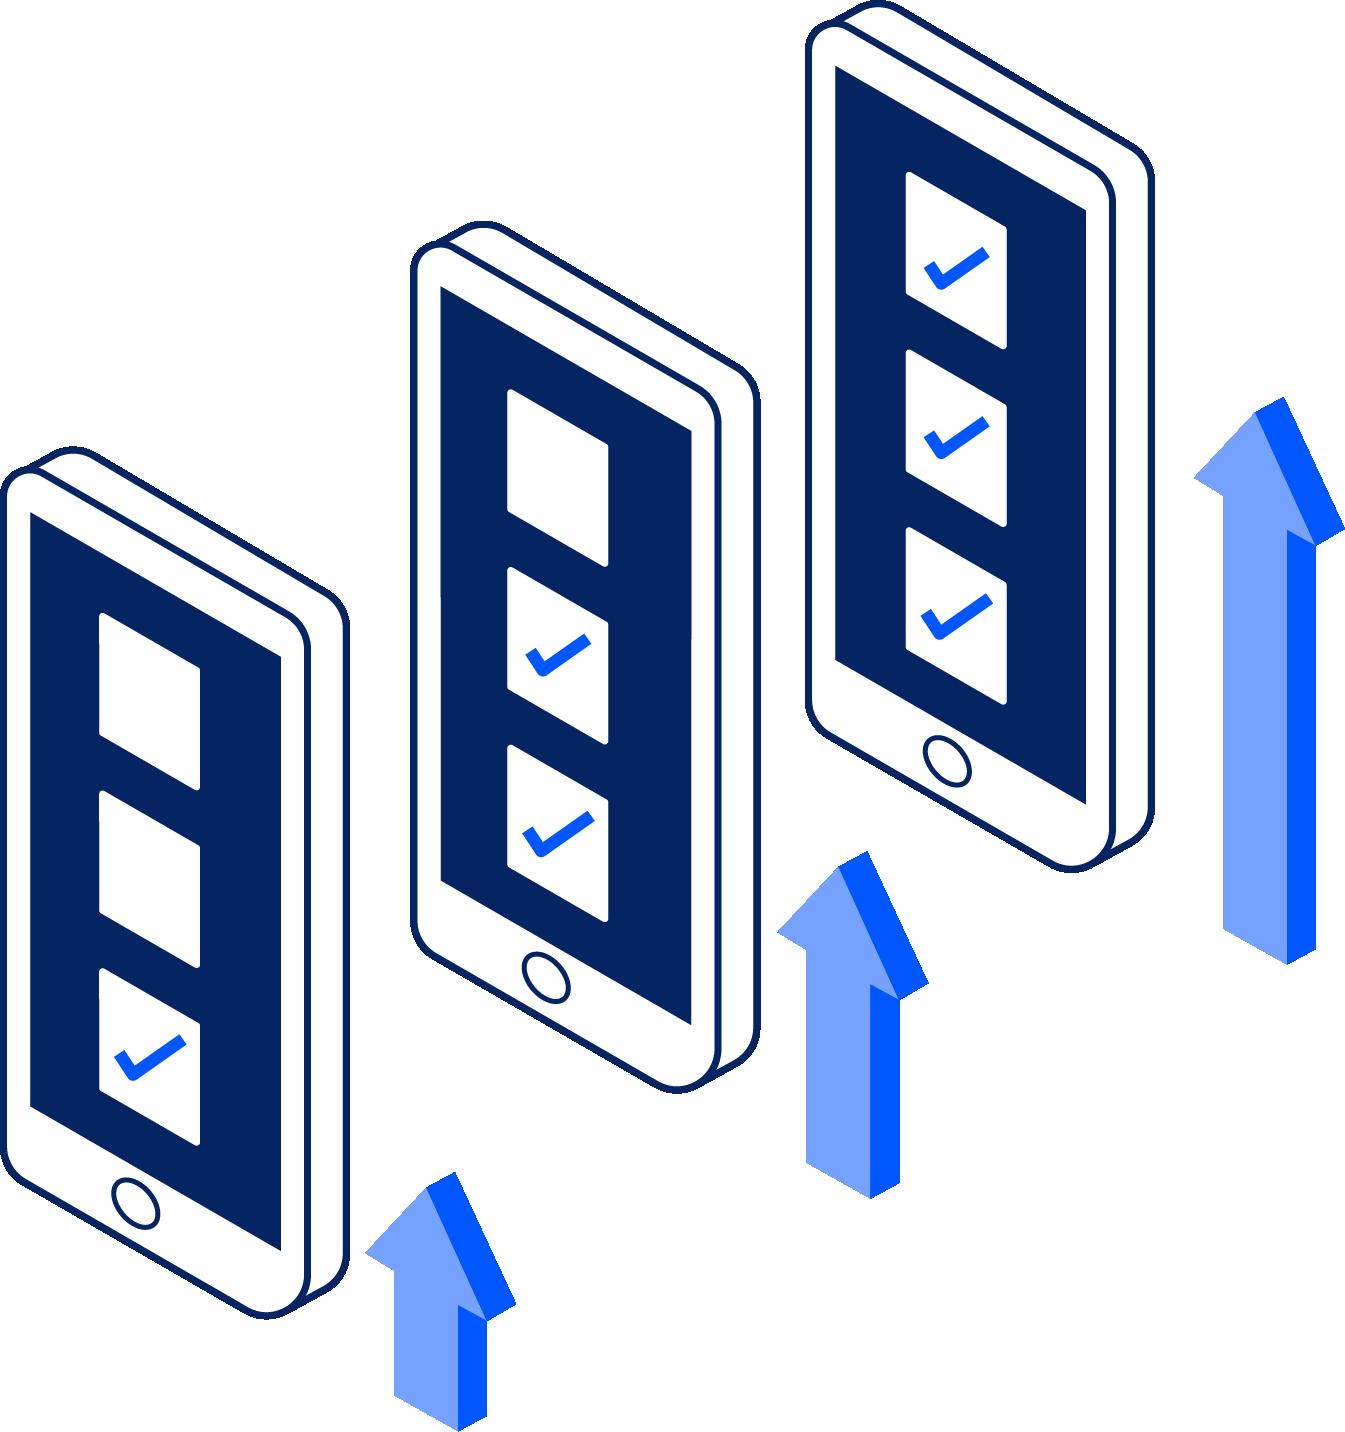 Self-optimizing processes